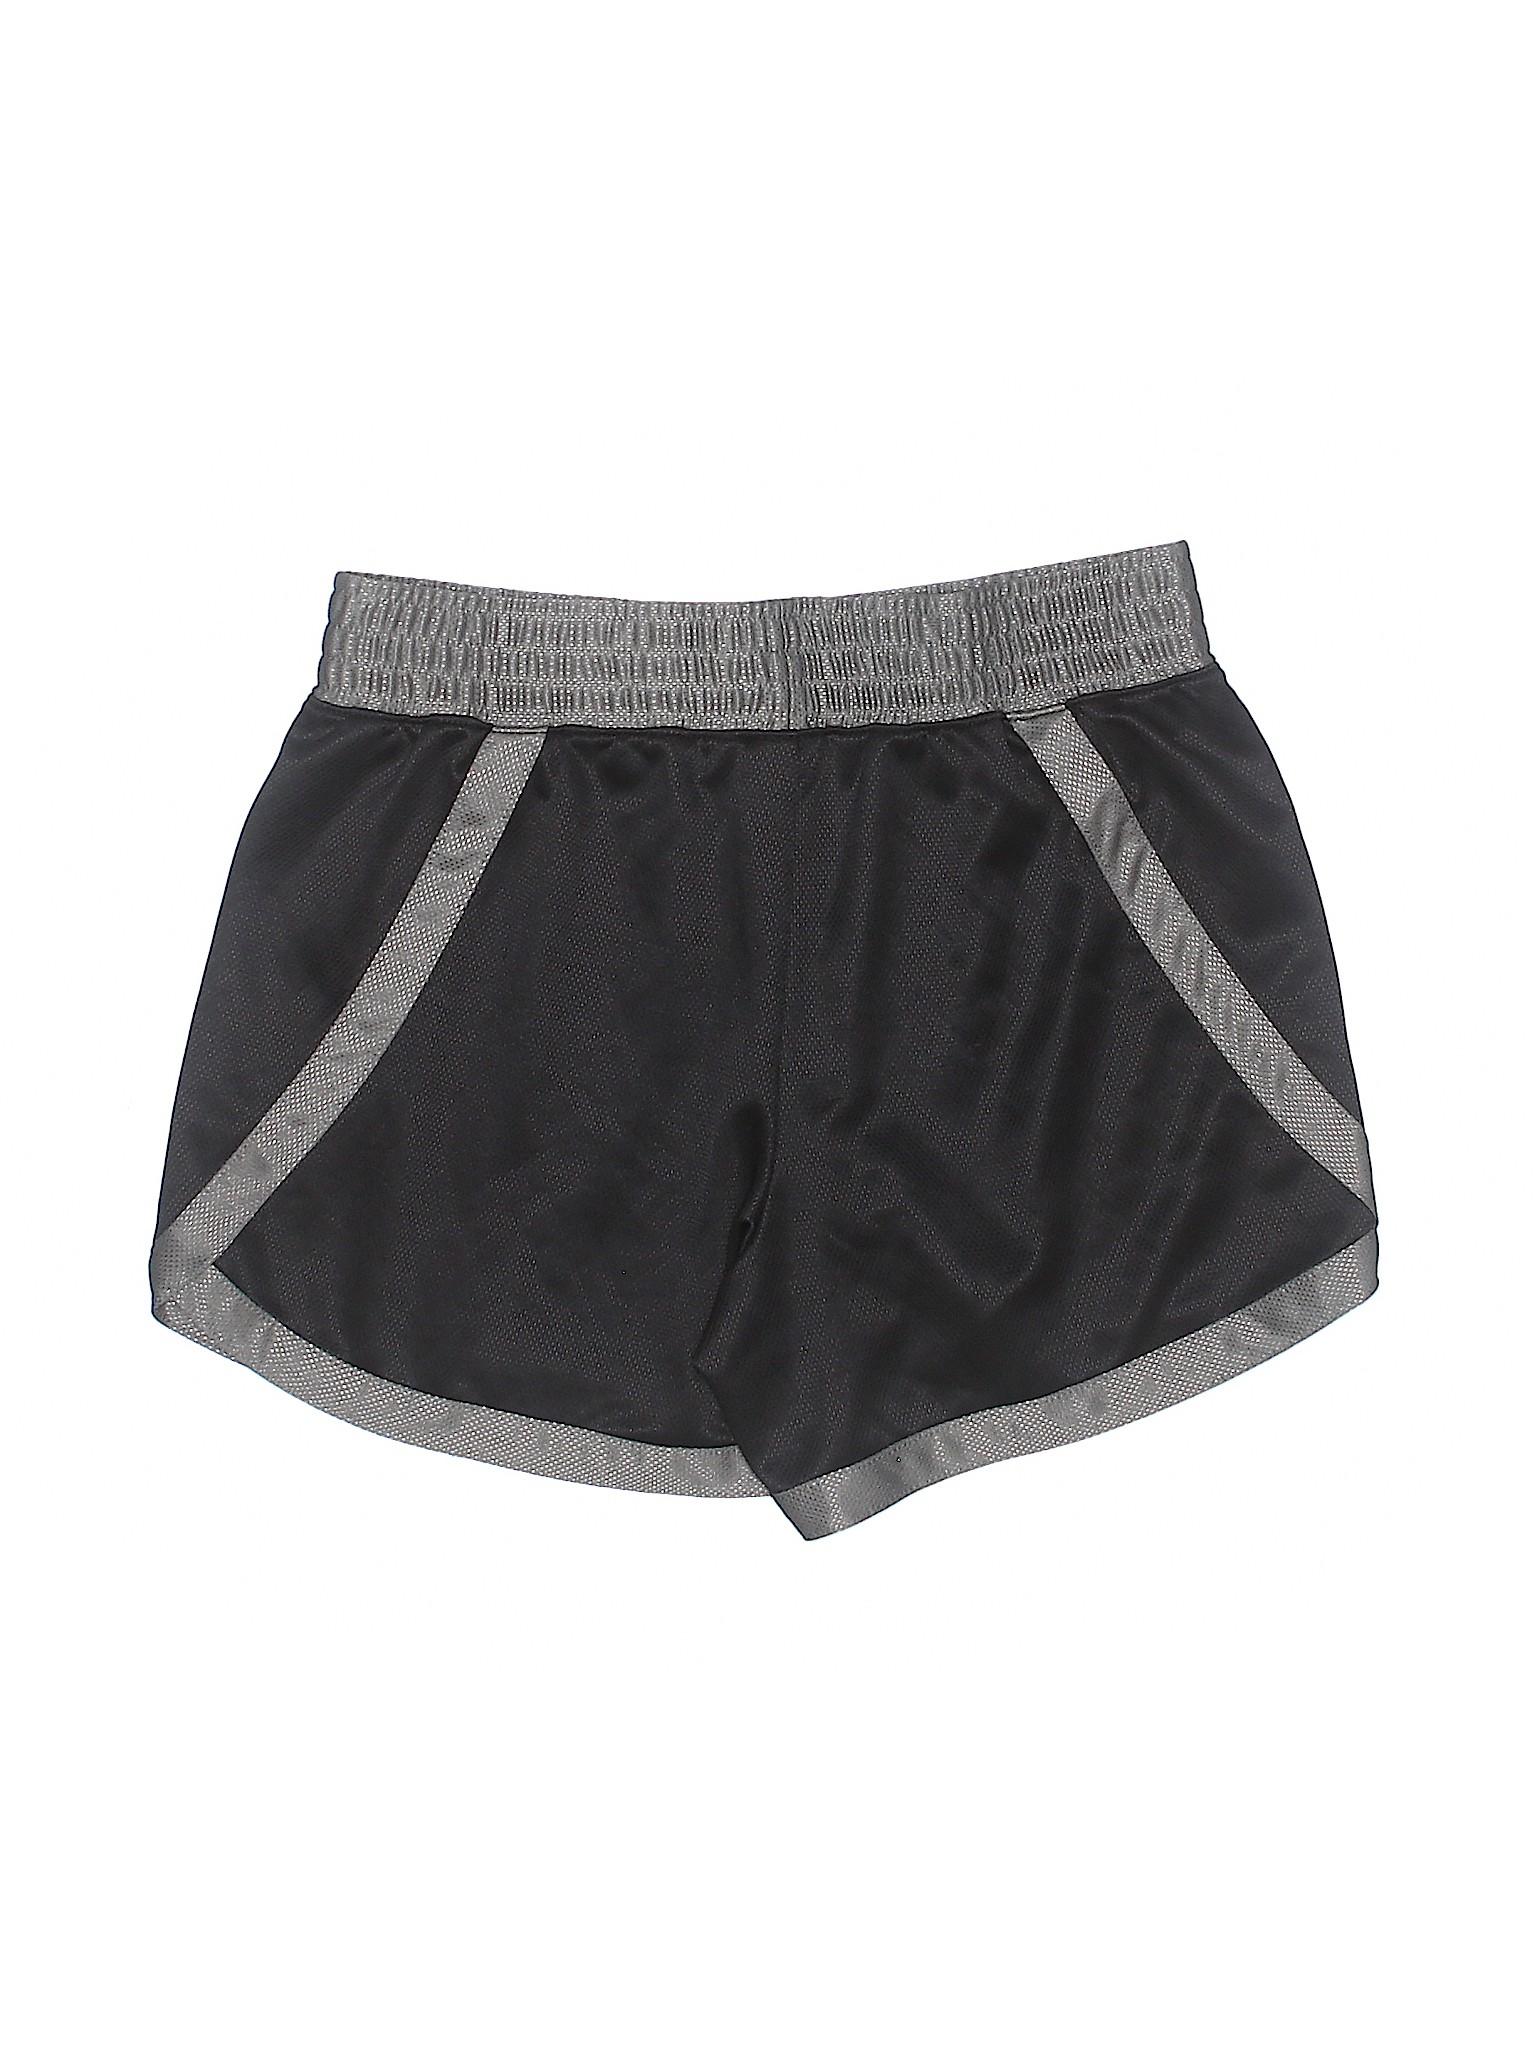 Boutique Athletic Shorts Champion Boutique Champion 6qUwa